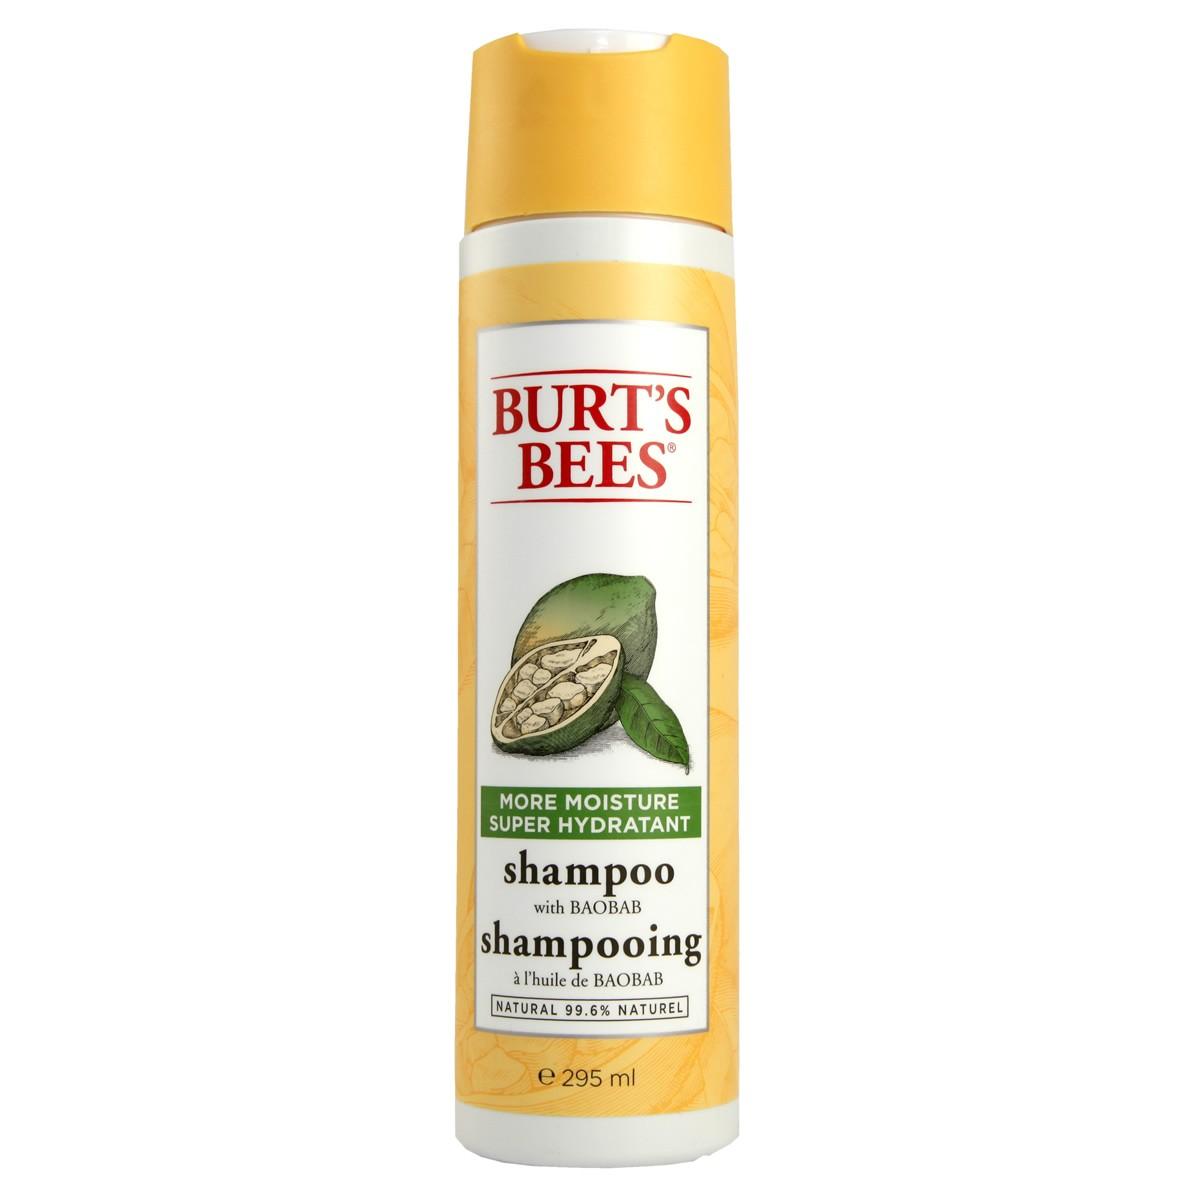 Burt`s Bees More Moisture Shampoo with Baobab